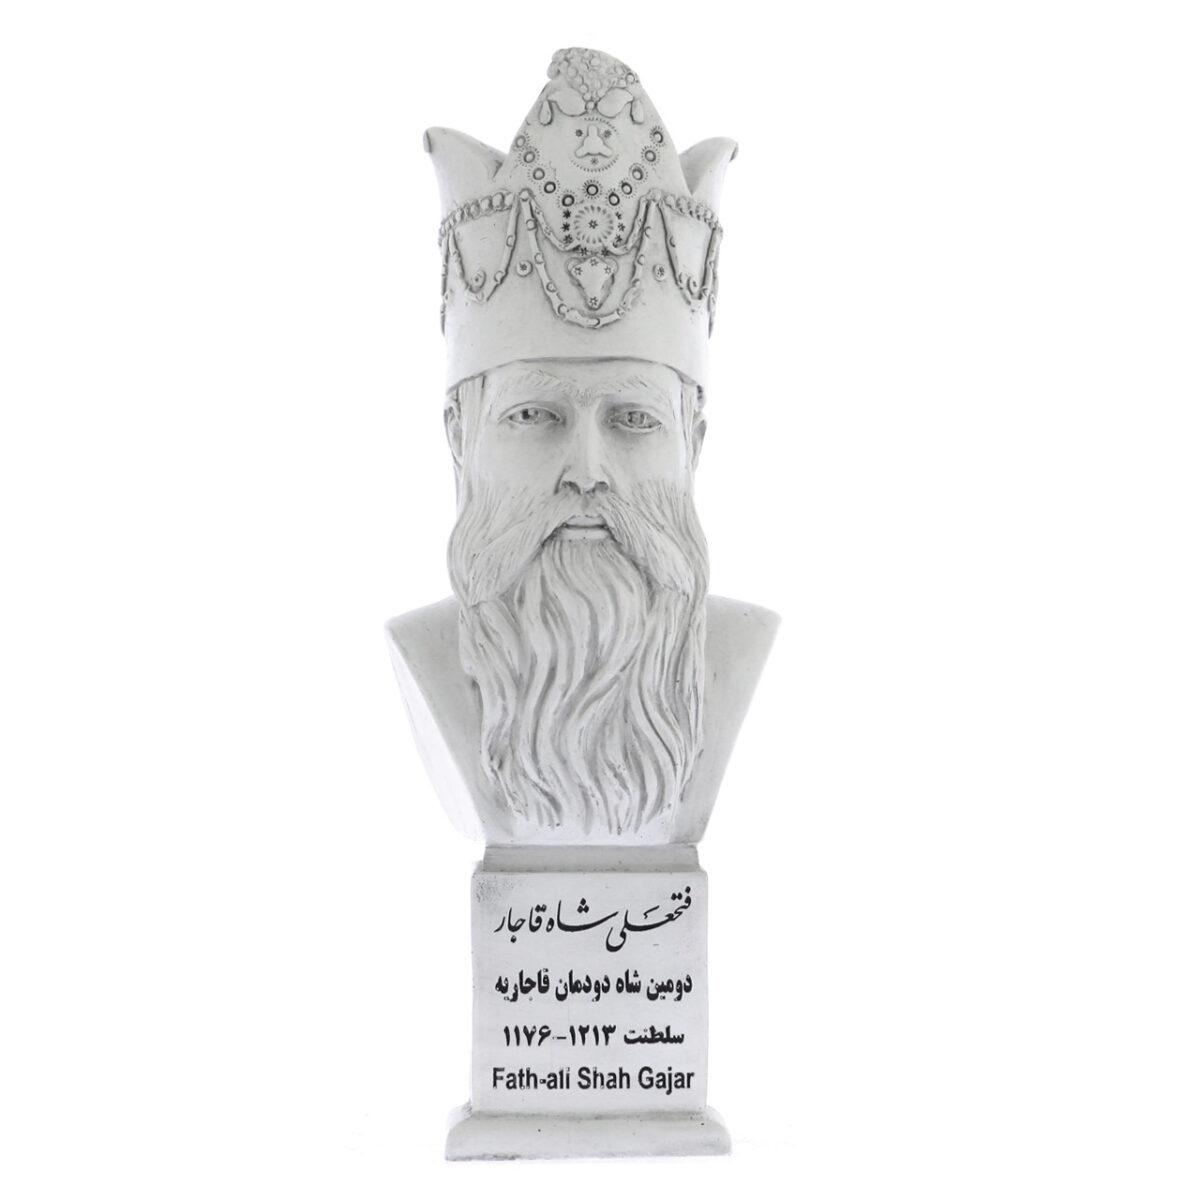 fatali shah s 1200x1200 - سردیس فتحعلی شاه